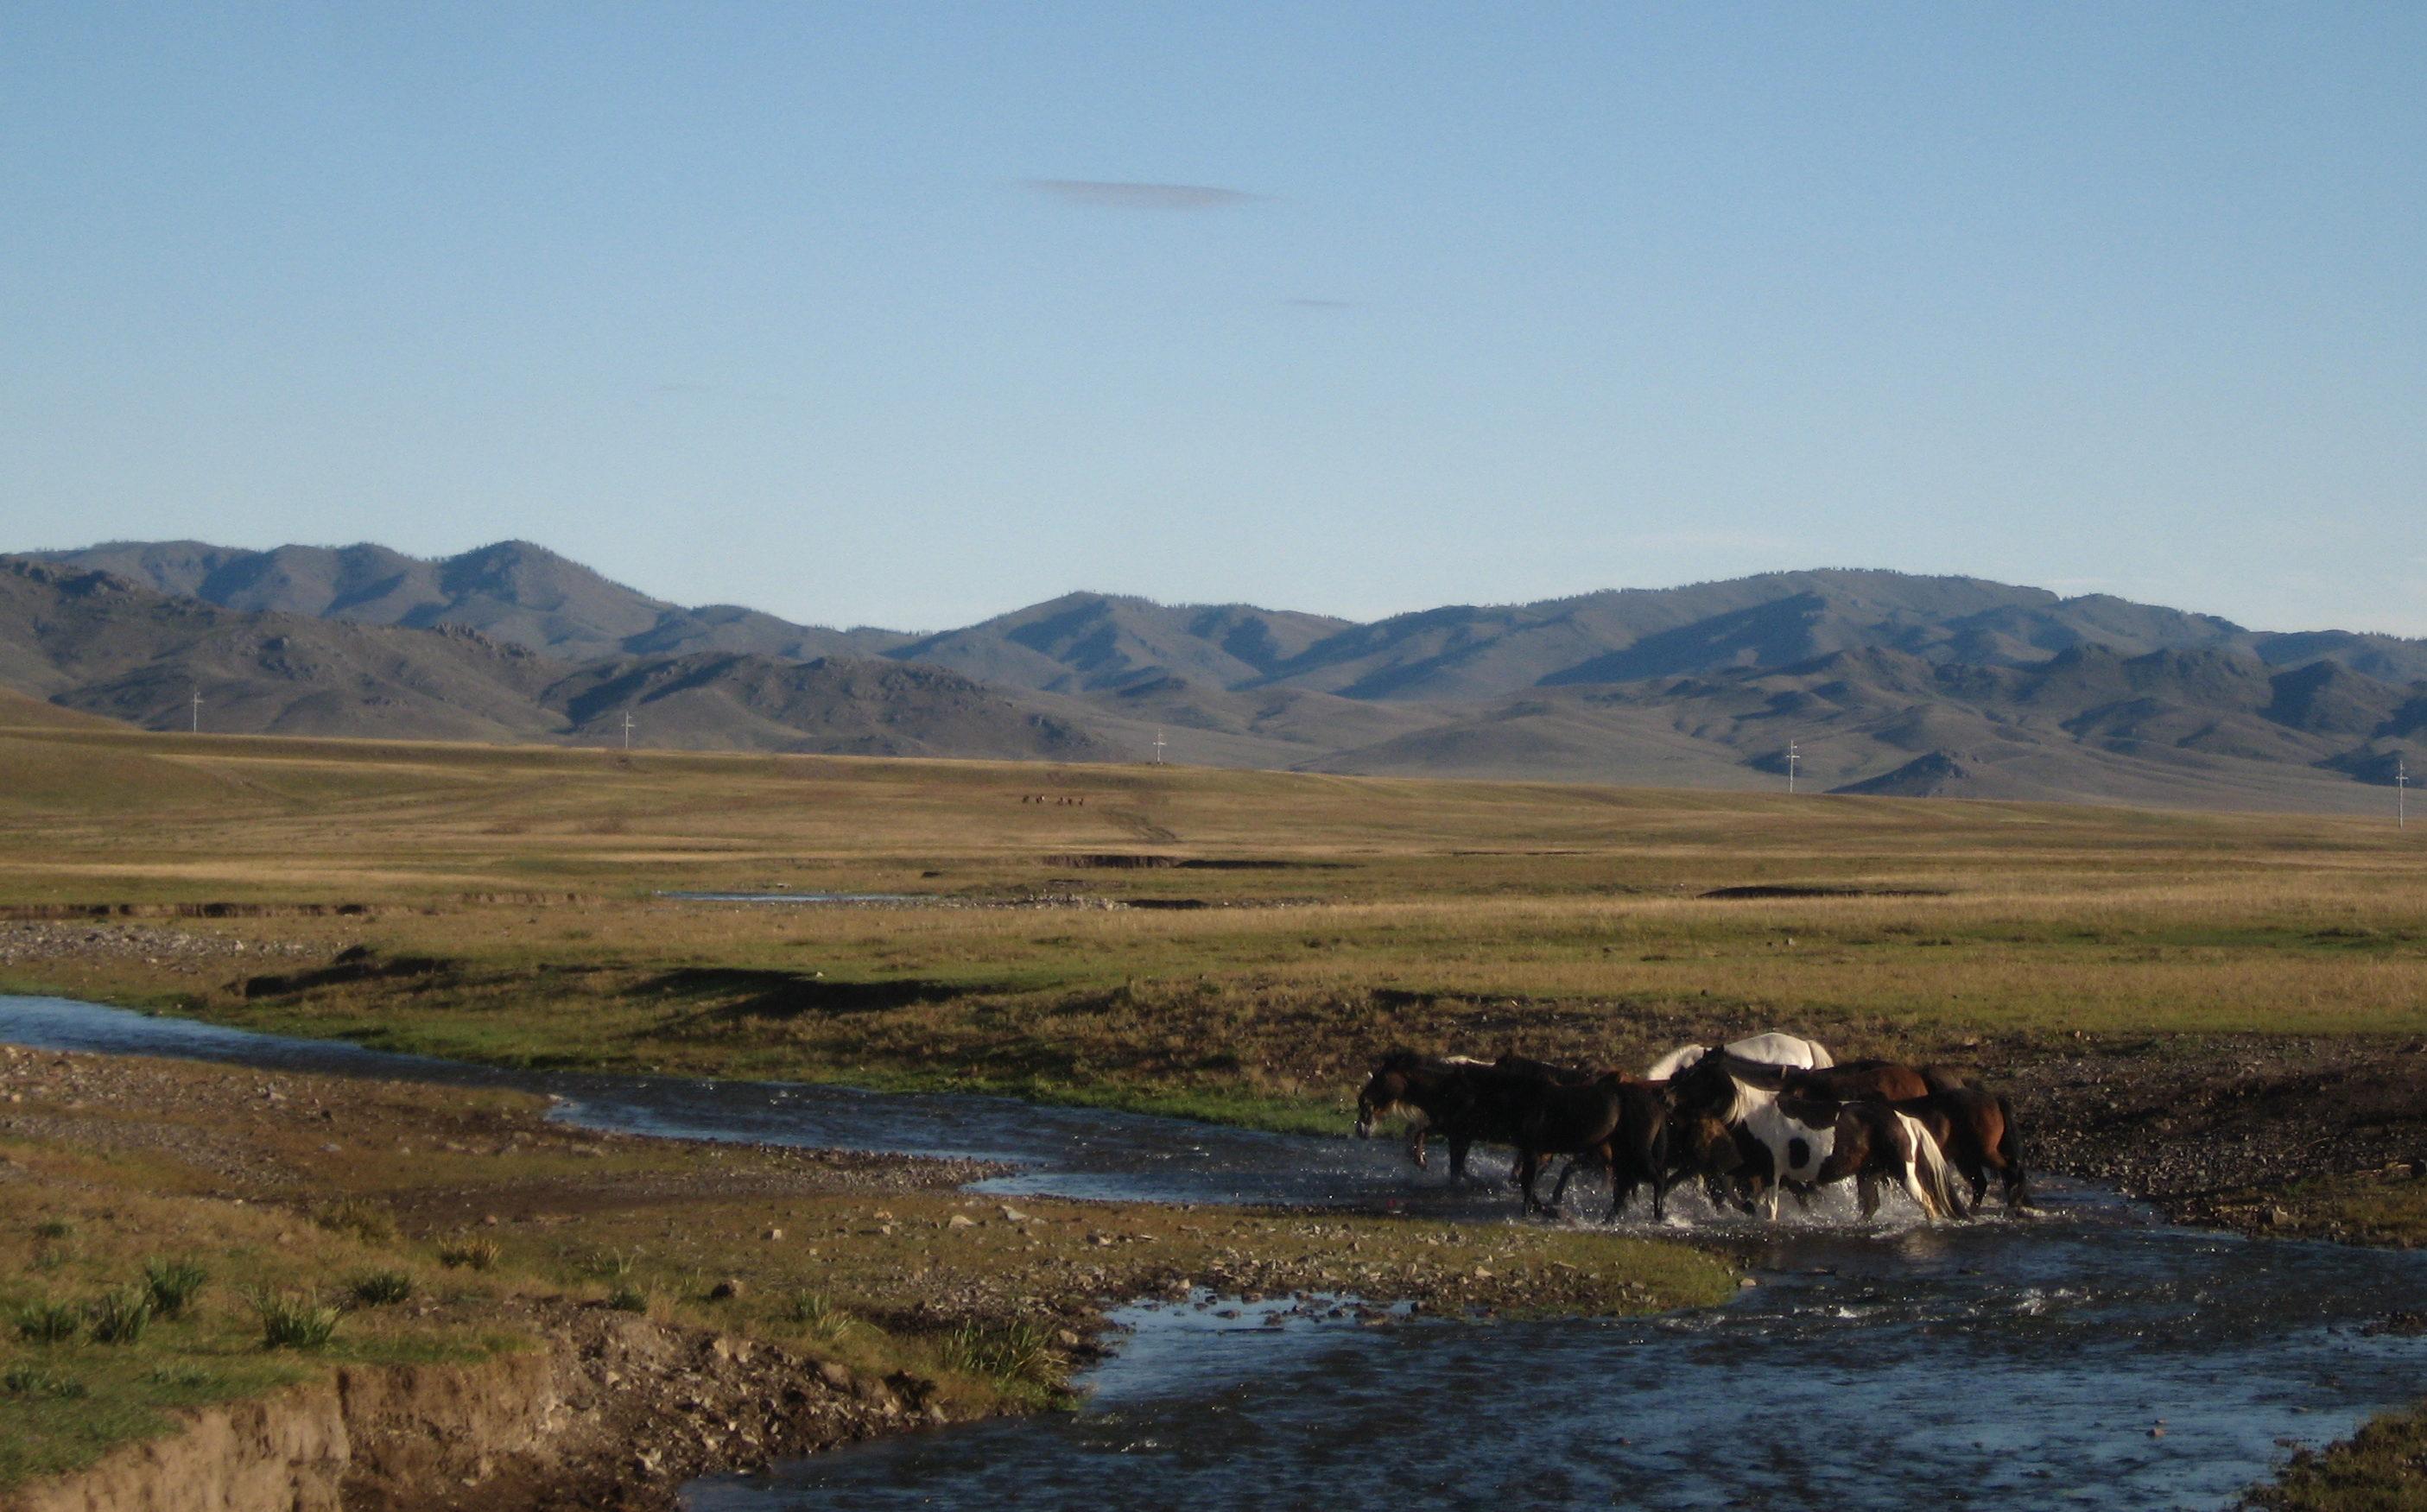 Horses crossing a river - Mongolia